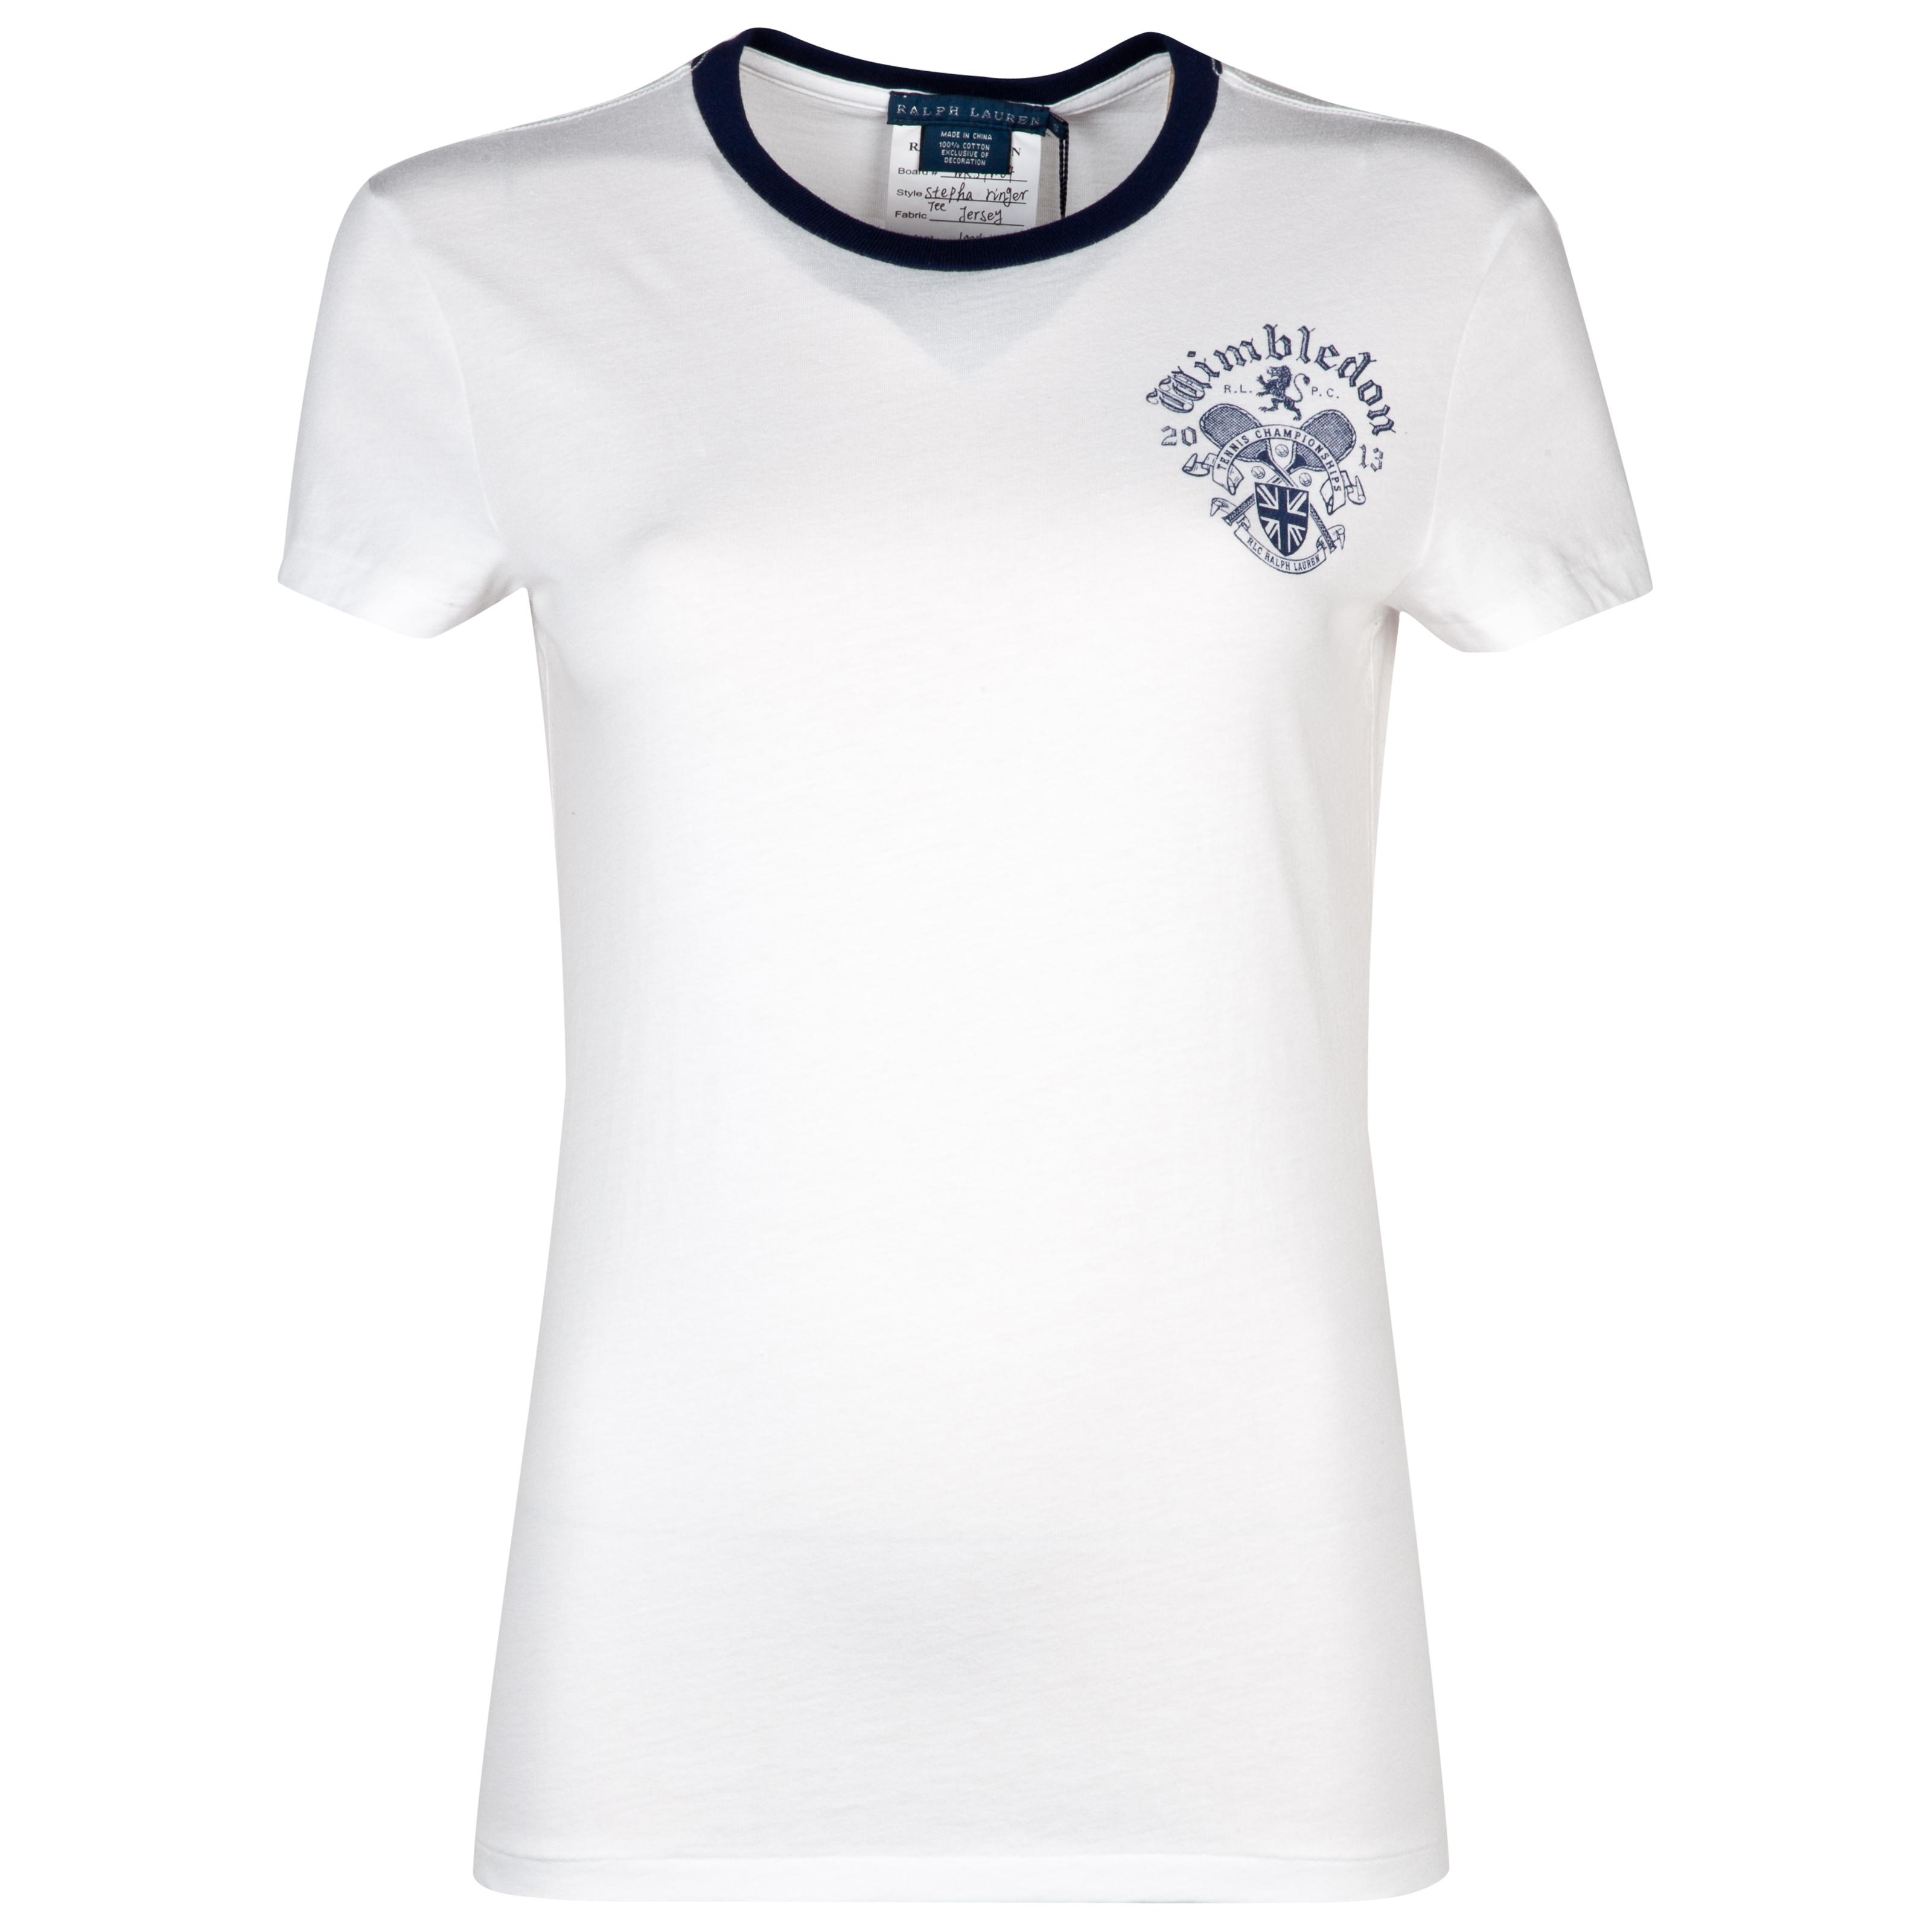 Polo Ralph Lauren Polo Stepha Ringer T-shirt - Classic Oxford White - Womens